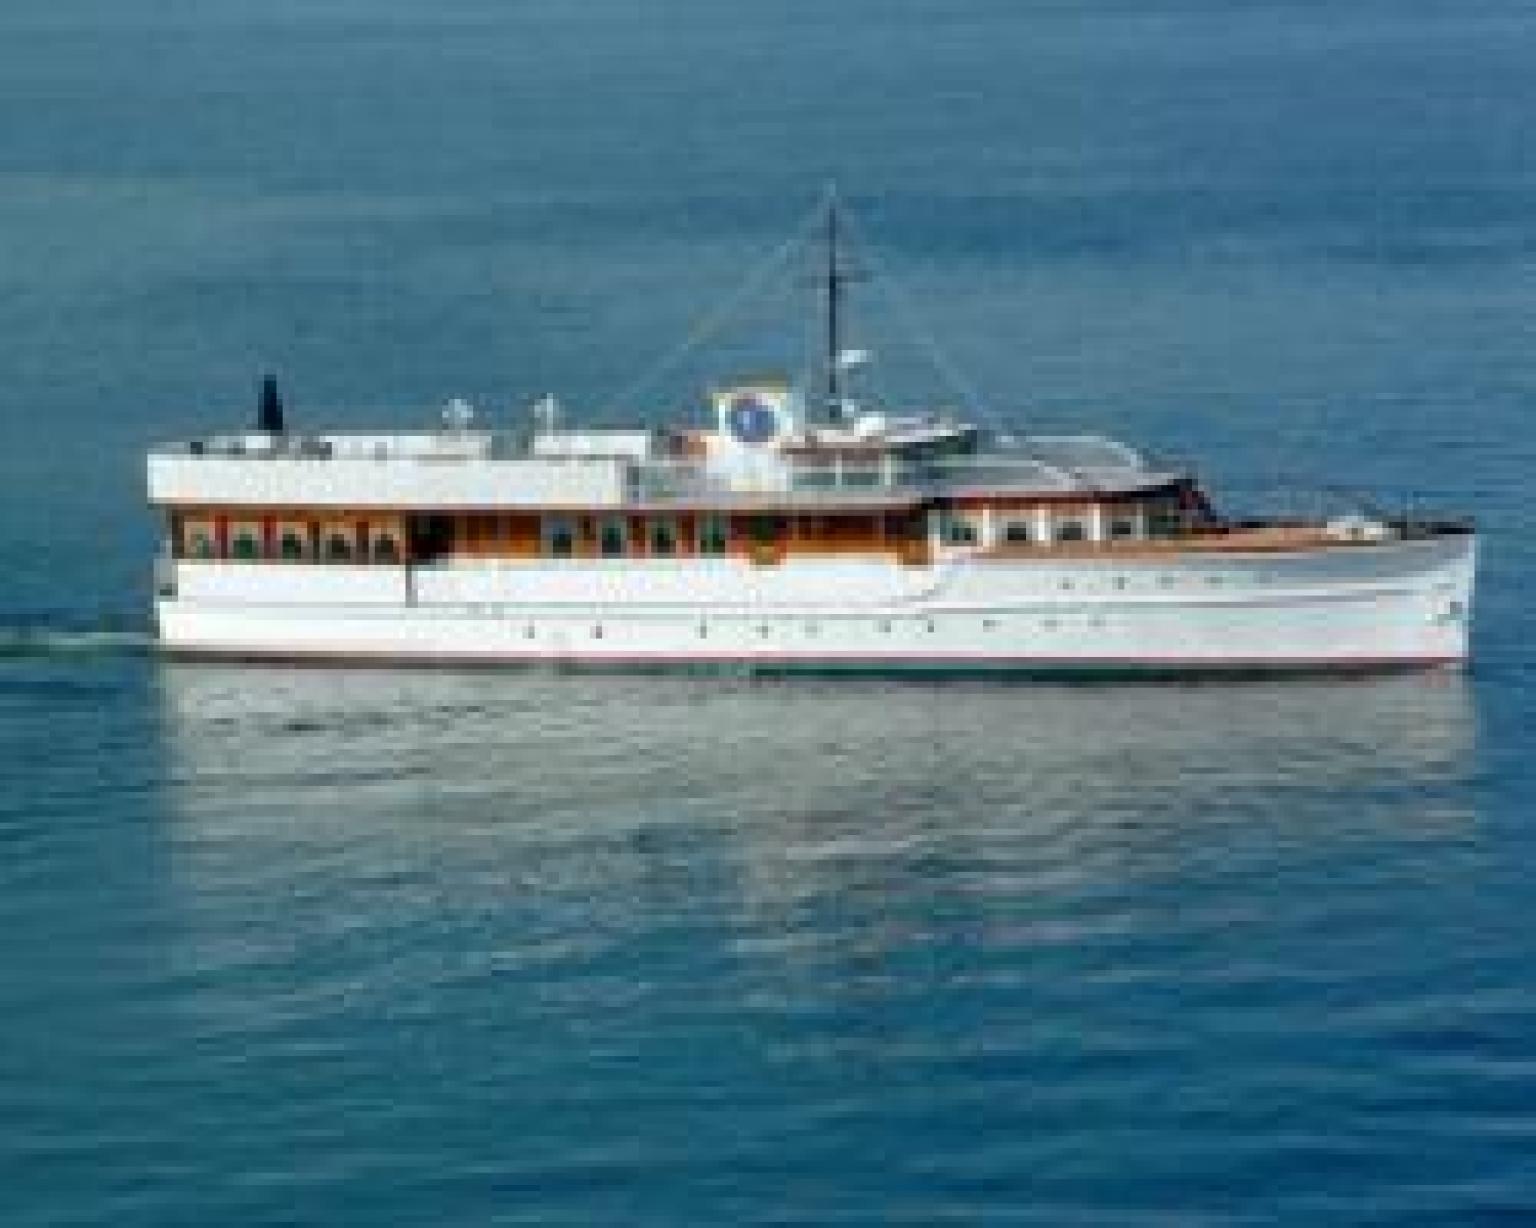 Jfk Presidential Yacht 39 Honey Fitz 39 Hosts 1 000 A Head